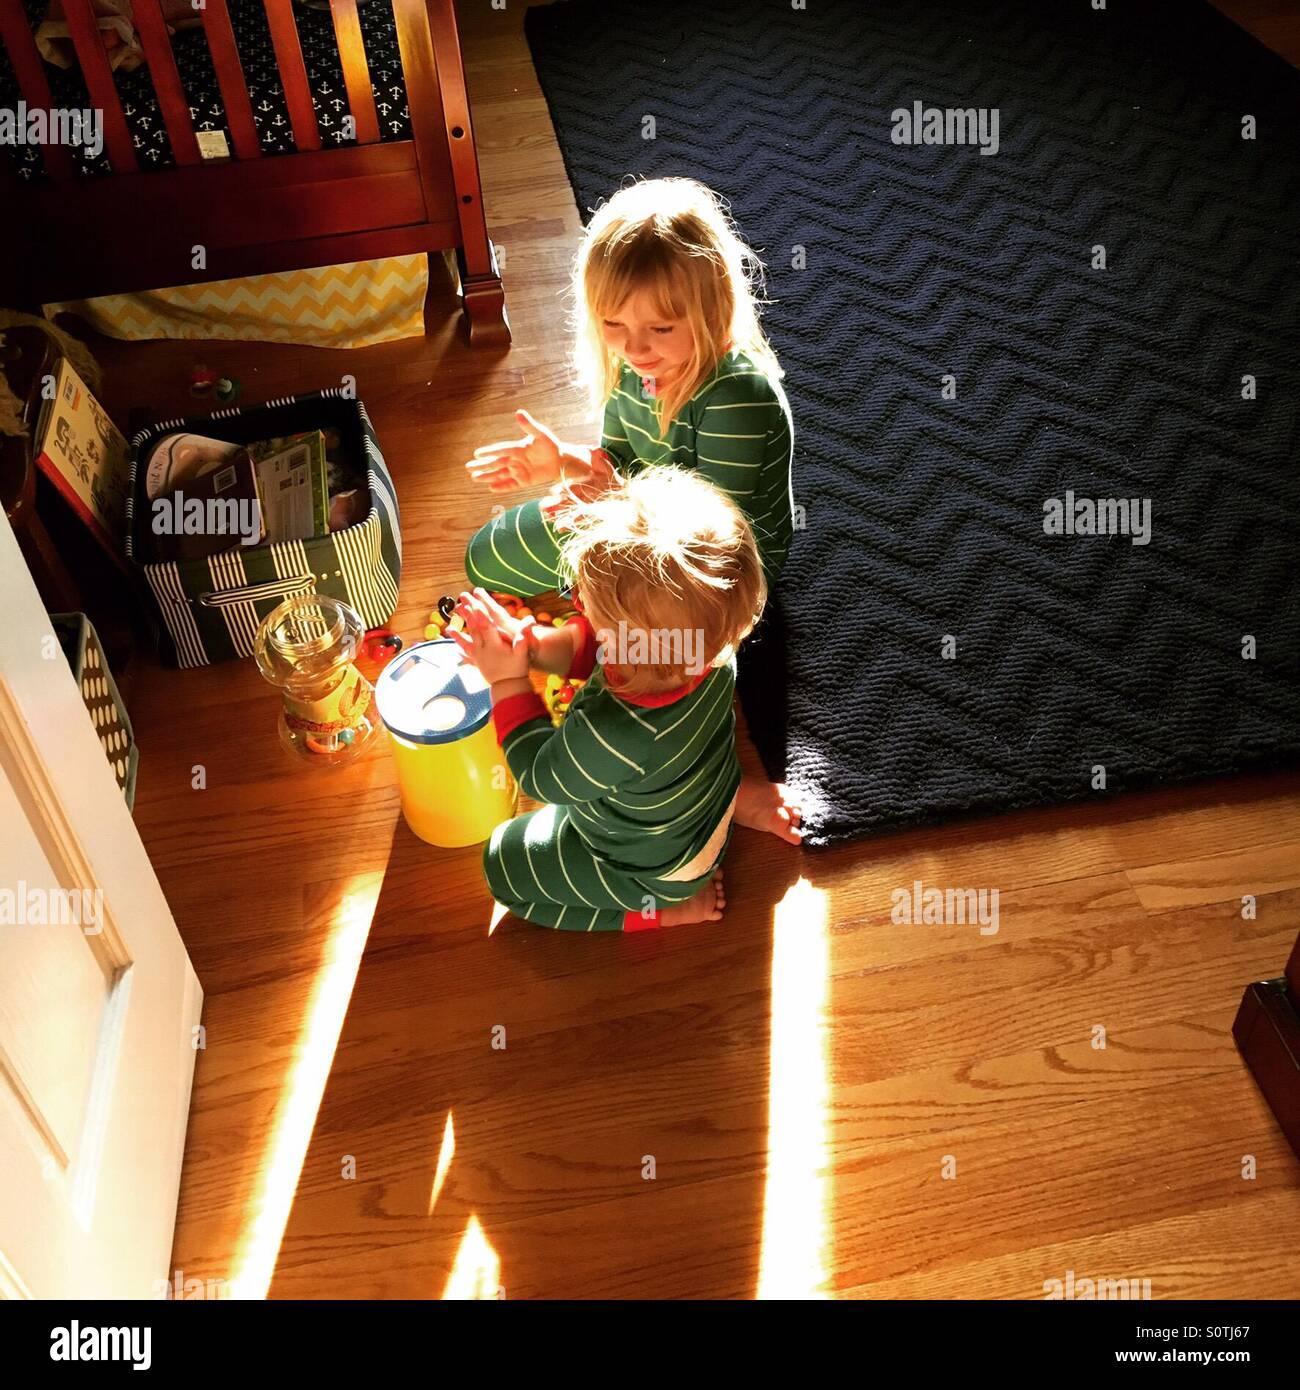 Matin jeu entre frère et soeur en pyjama correspondant Photo Stock